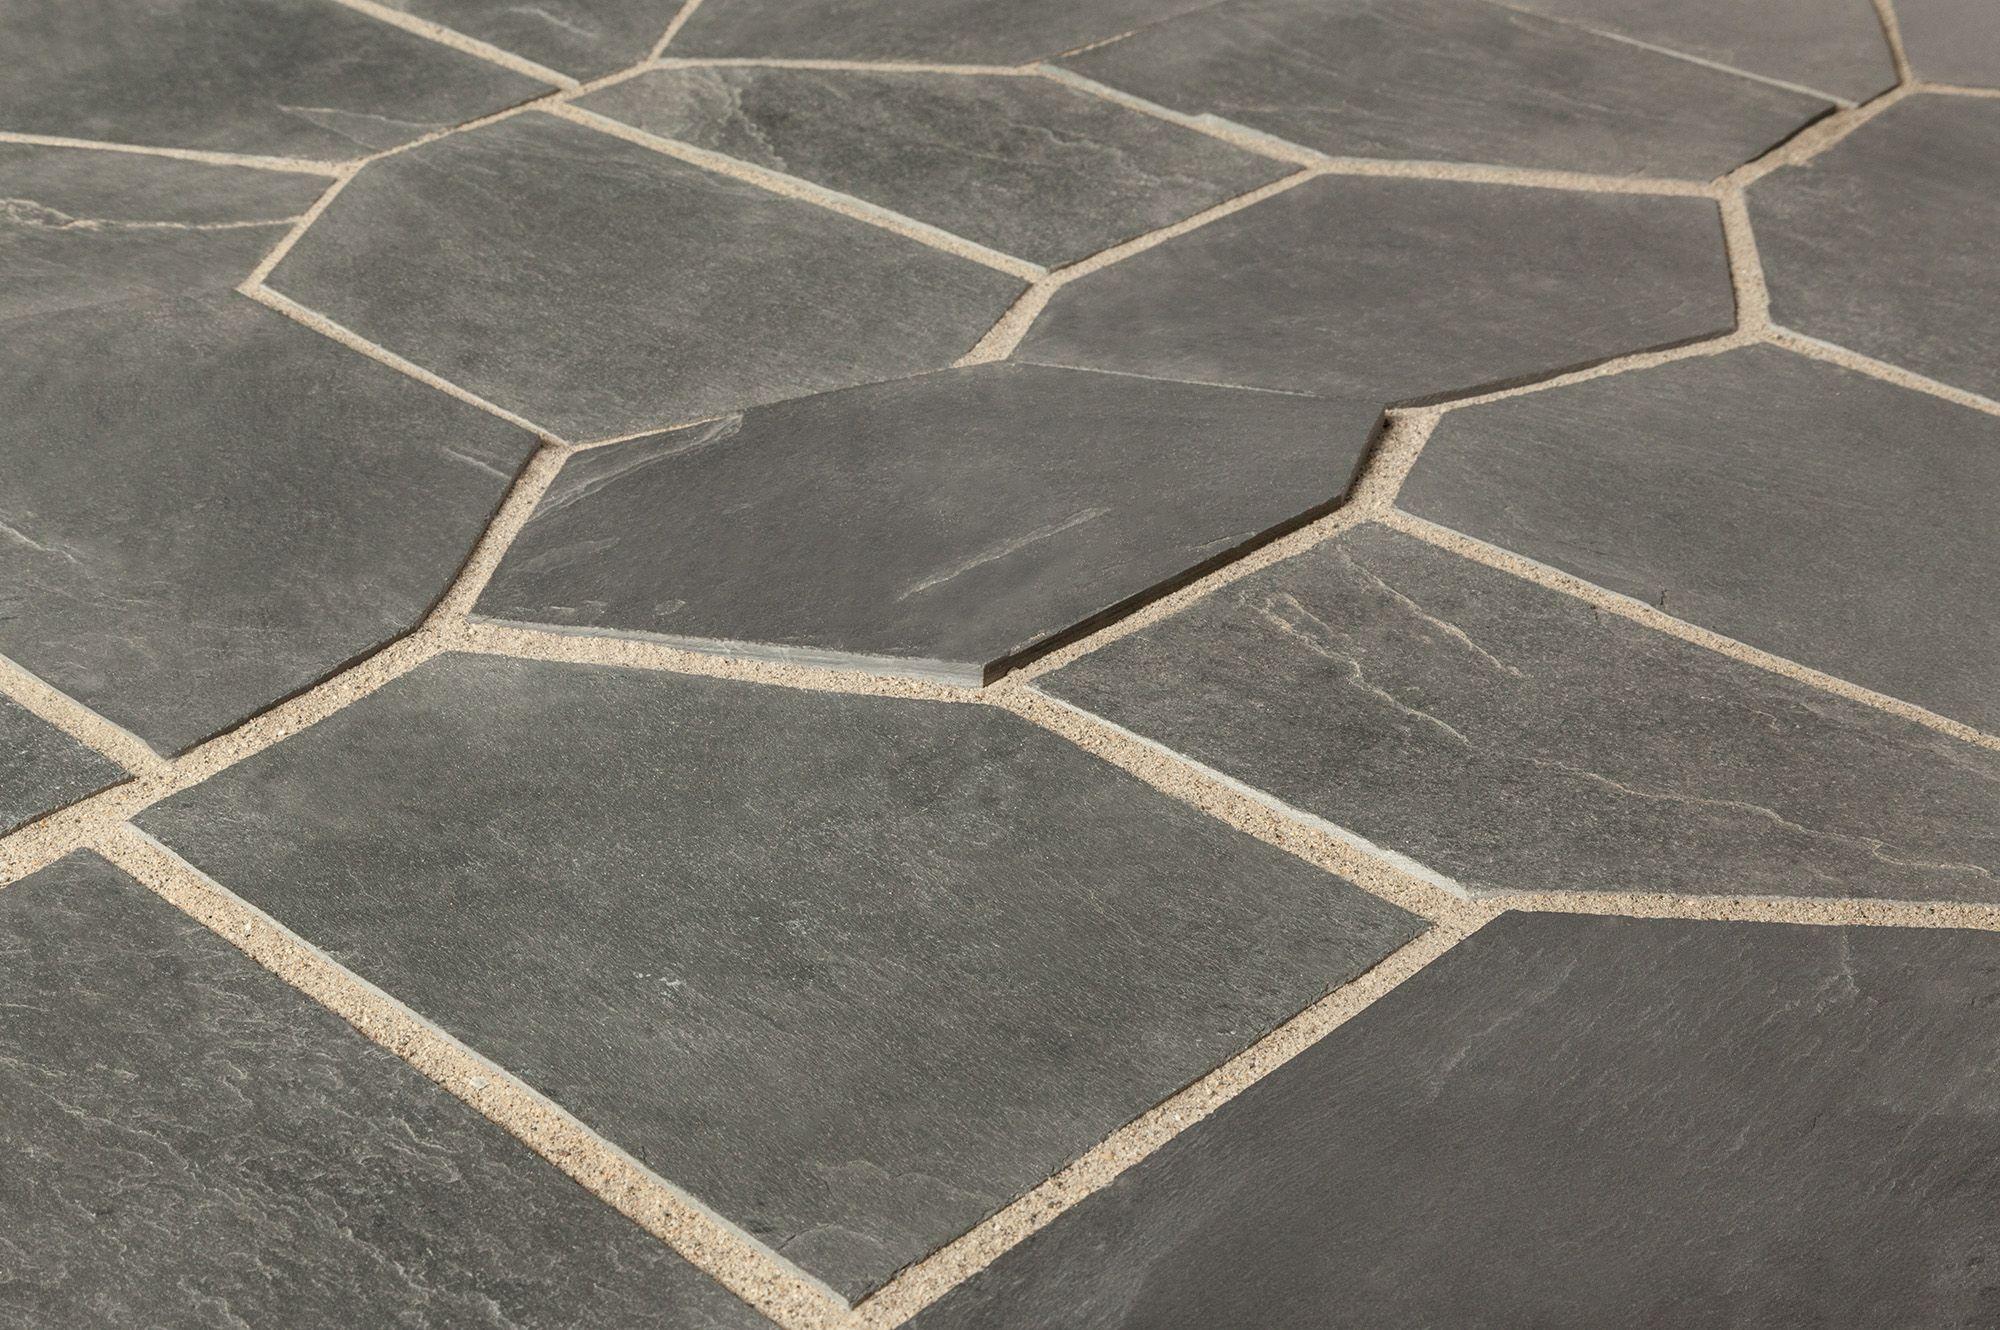 Builddirect Roterra Slate Tile Meshed Back Patterns Slate Tile Tile Mesh Builddirect